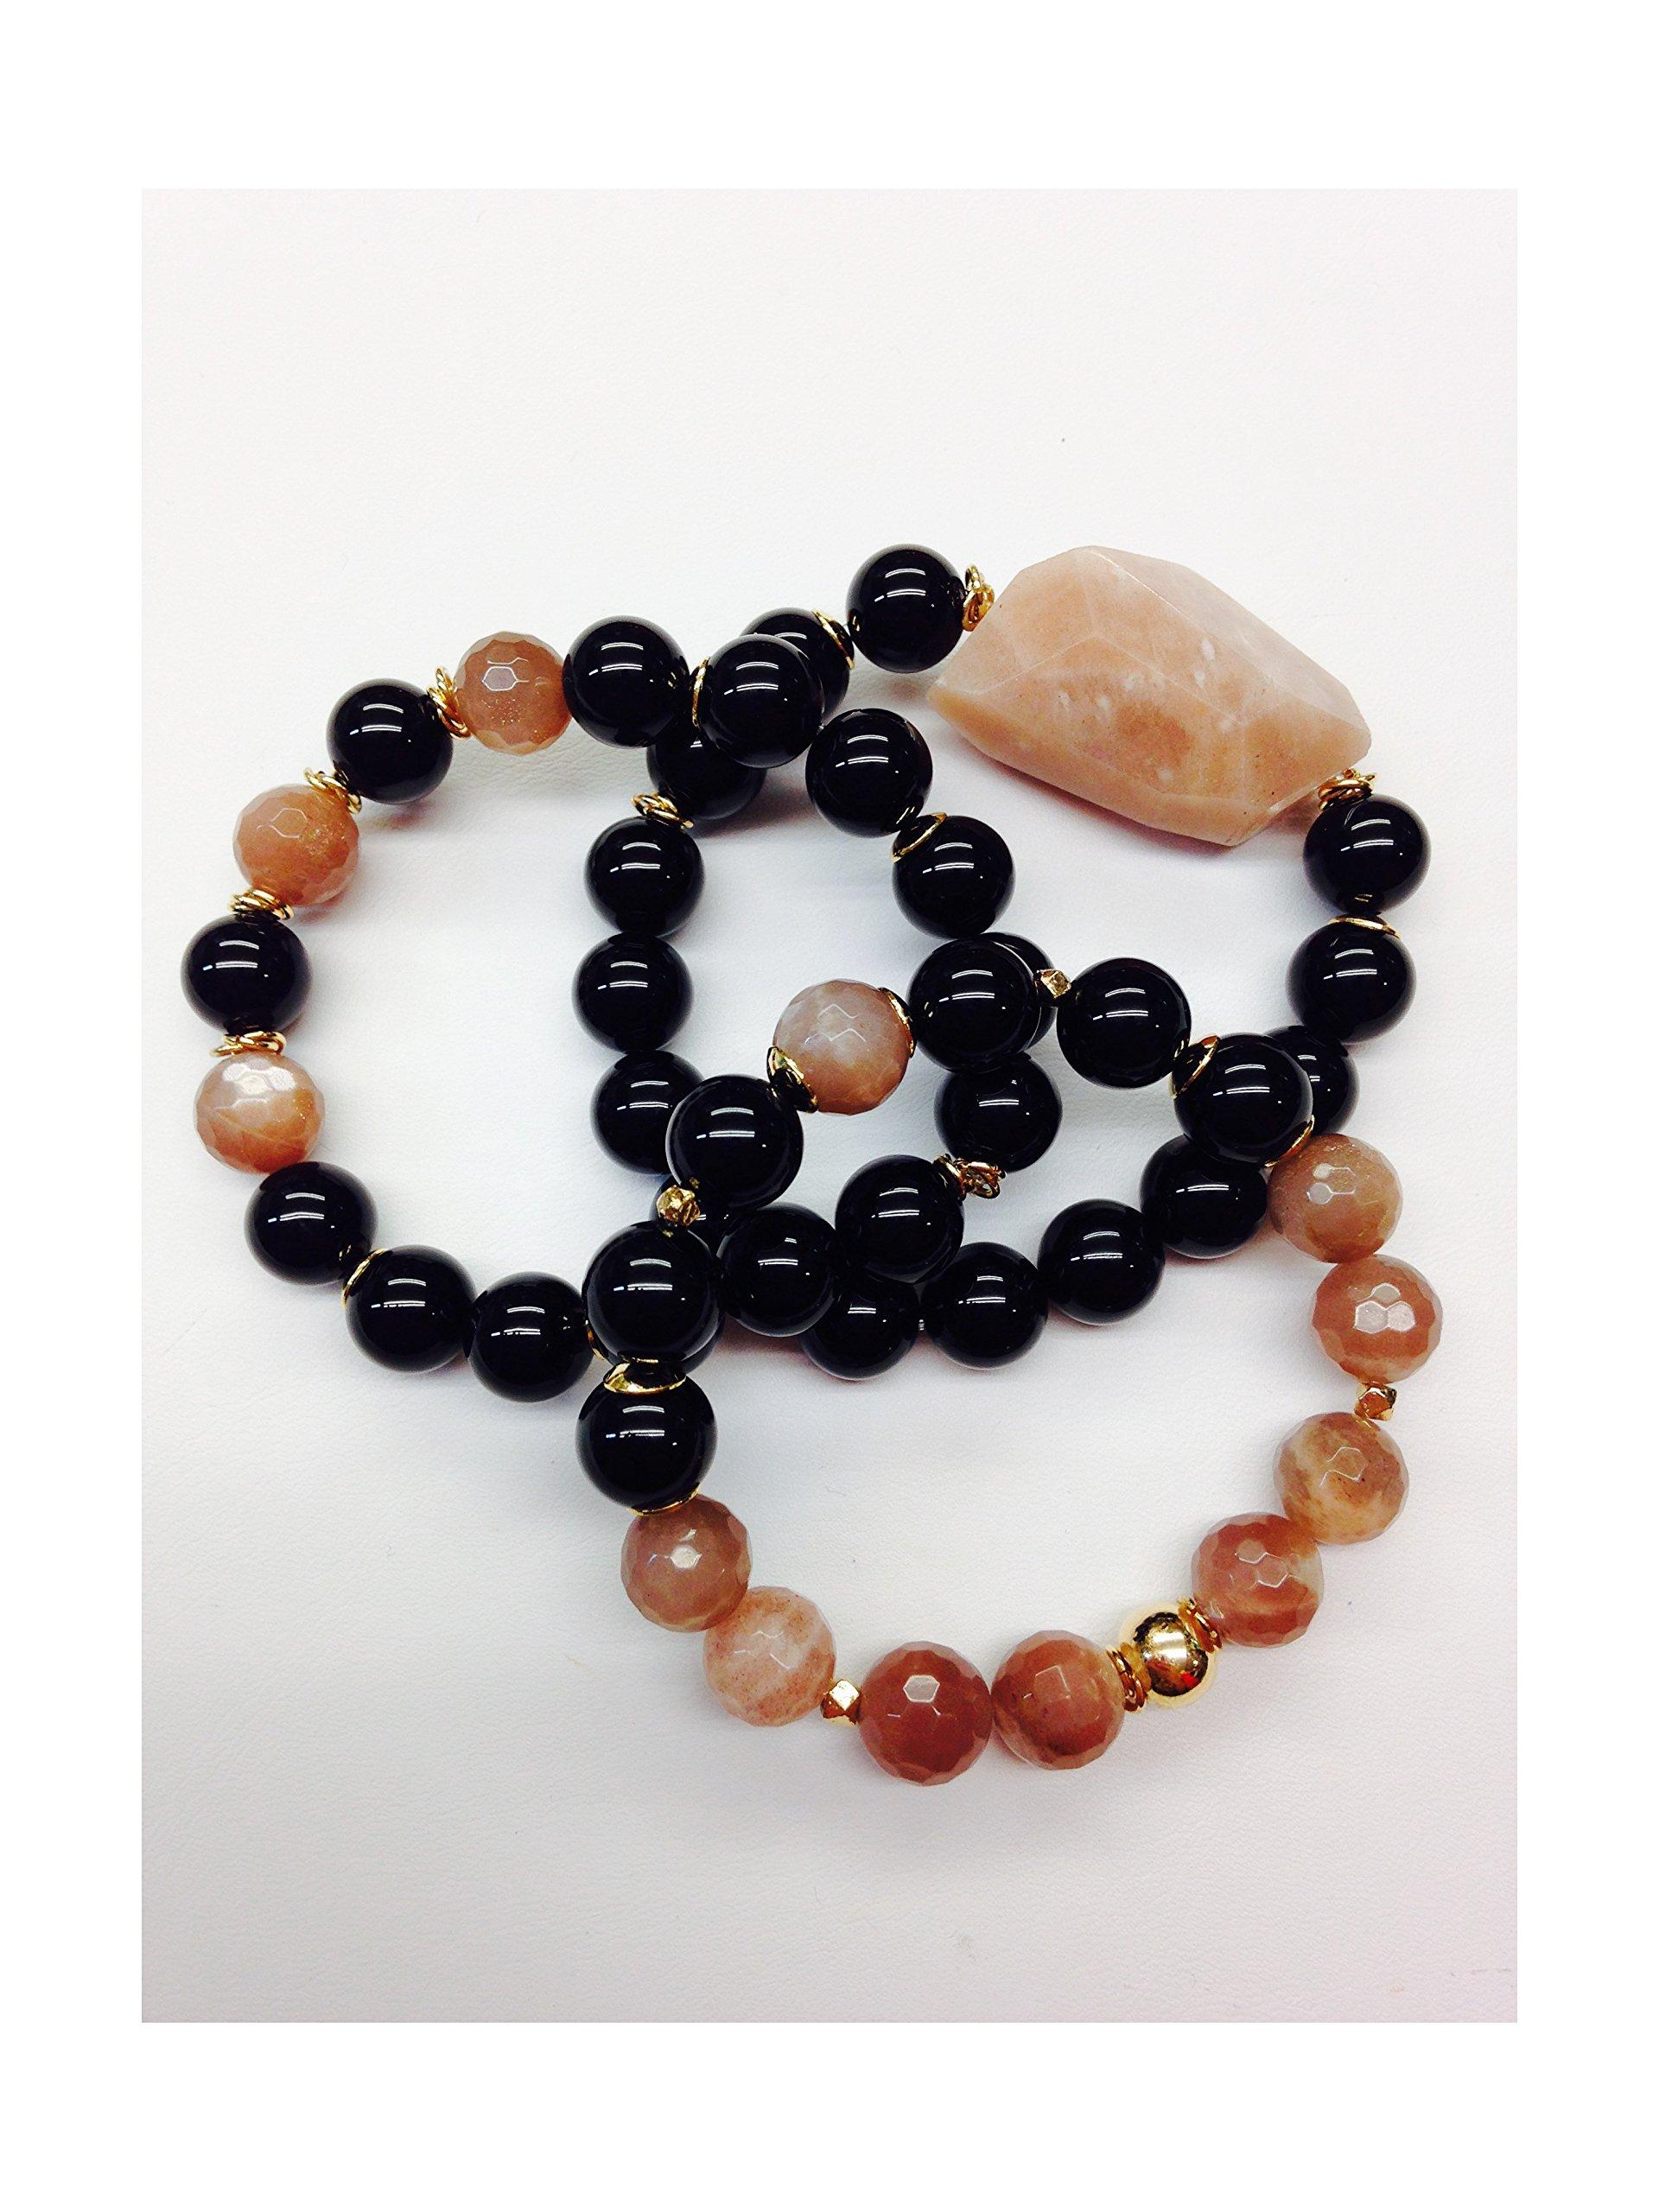 Set of 3 Handmade Bracelets - Black Onyx, Peach Moonstone, Giant Blush Moonstone Natural Stones & Goldfilled Beads by Formula Moda